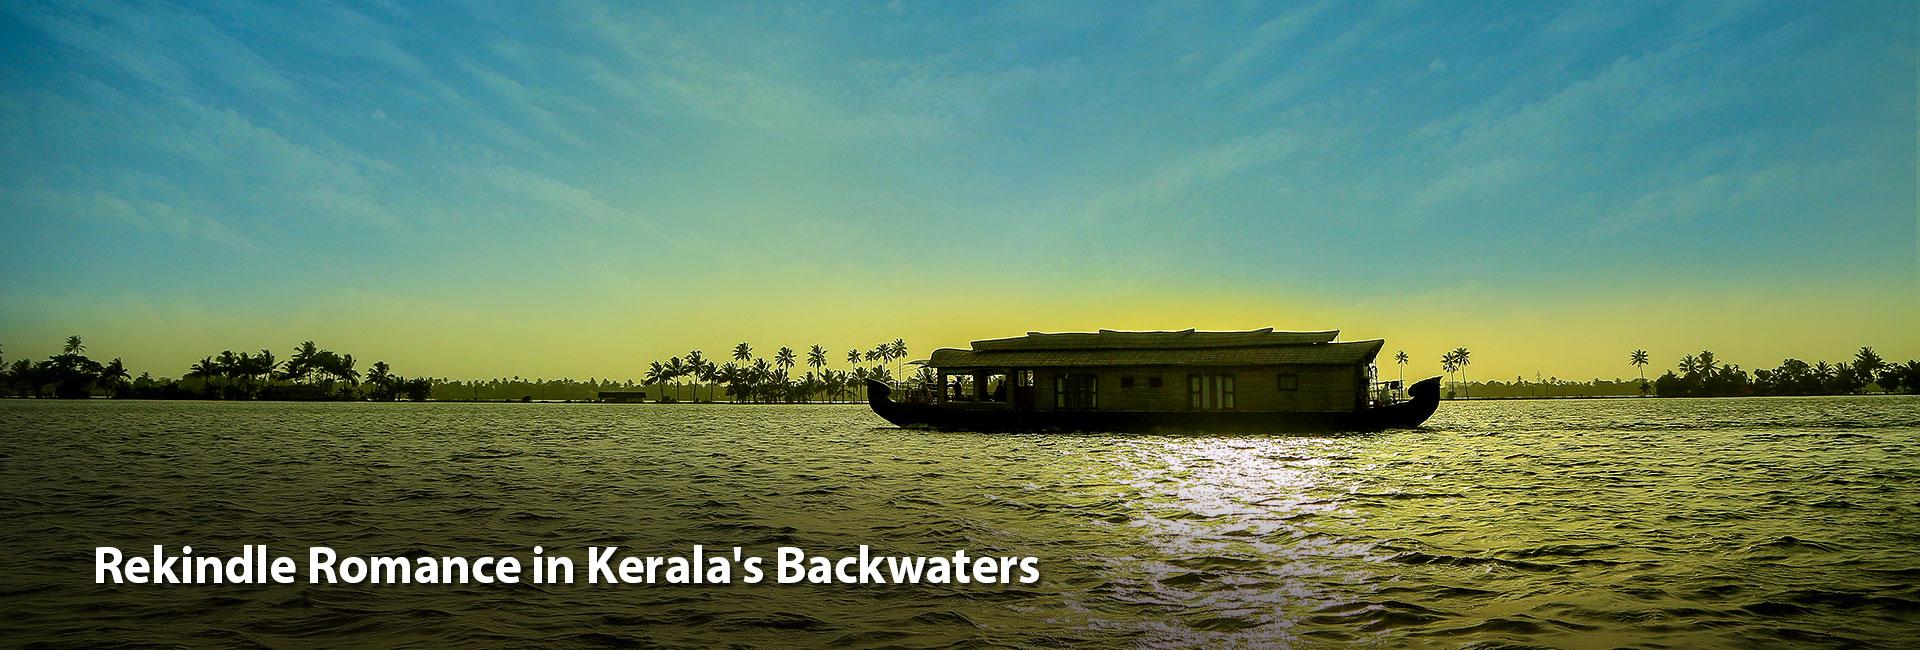 Rekindle Romance in Kerala's Backwaters